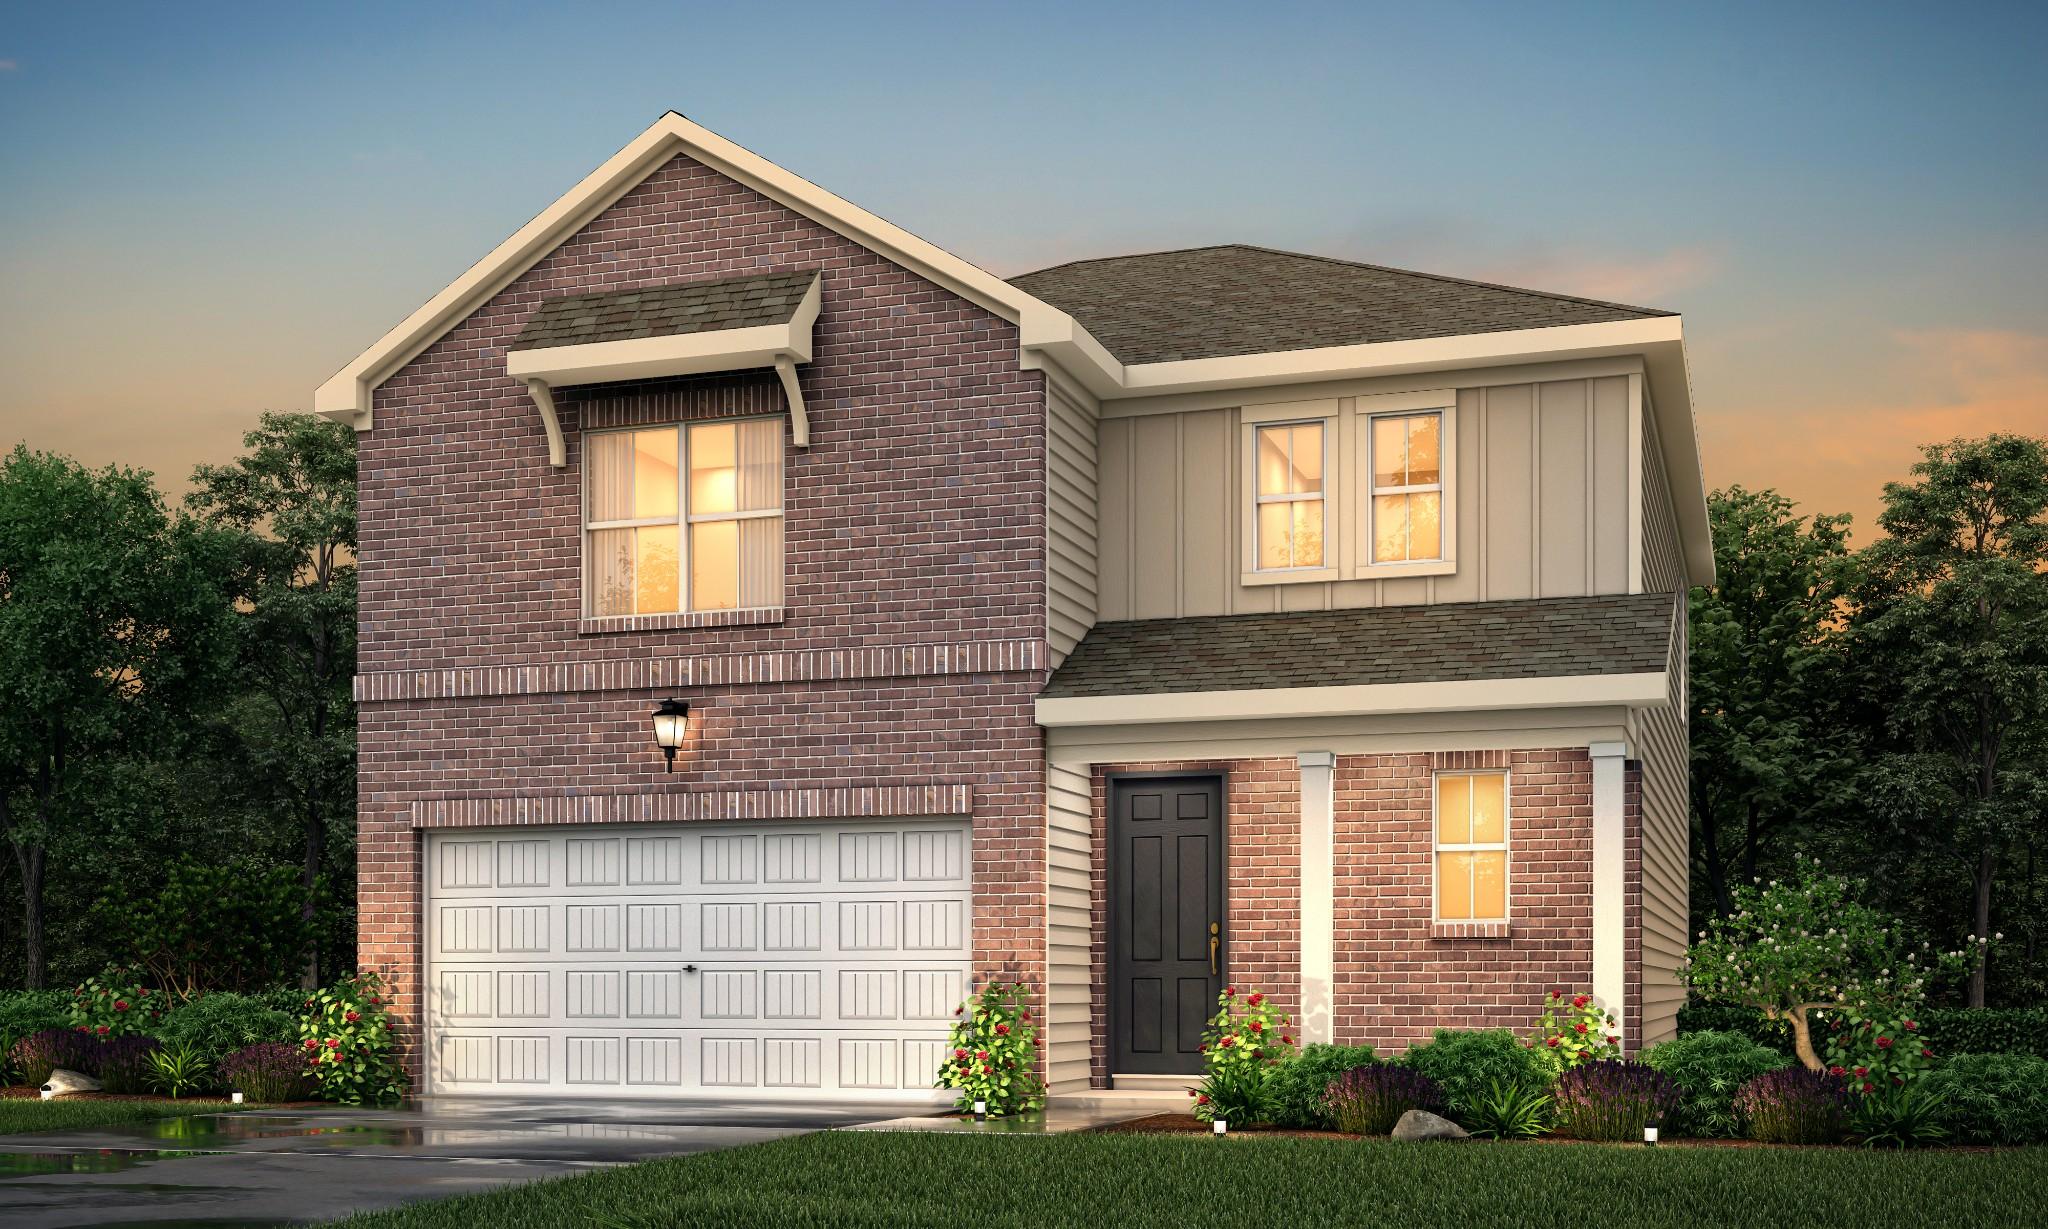 711 Amberton Dr, Smyrna, TN 37167 - Smyrna, TN real estate listing